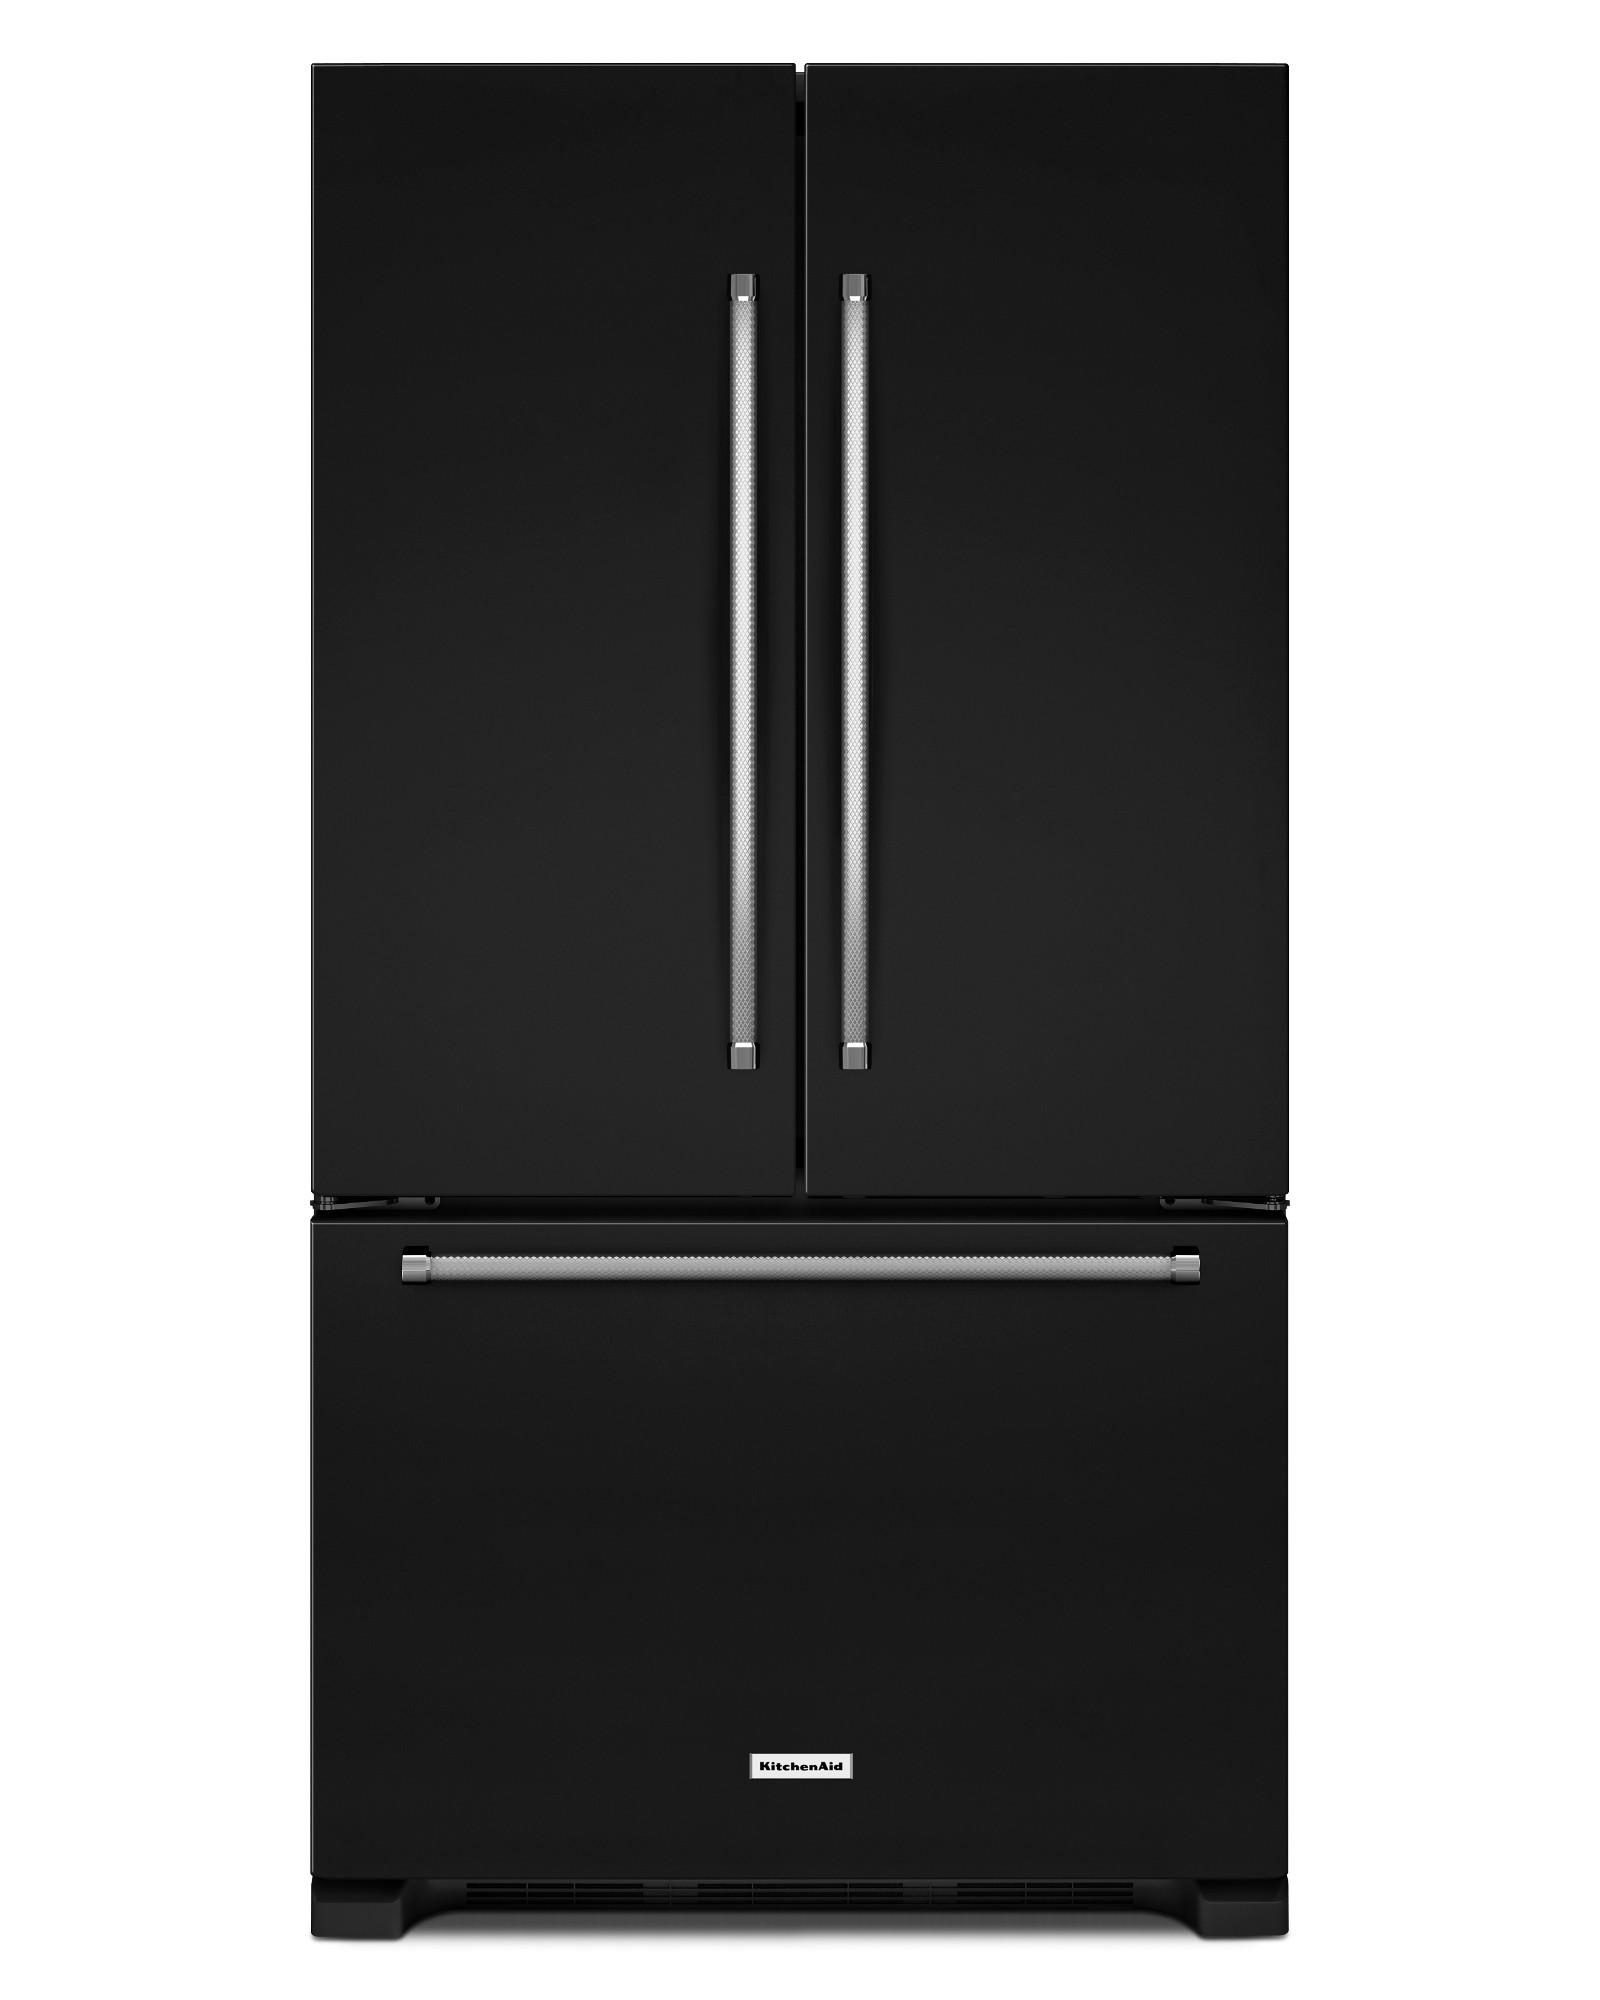 KRFC300EBL-20-cu-ft-Counter-Depth-French-Door-Refrigerator-Black